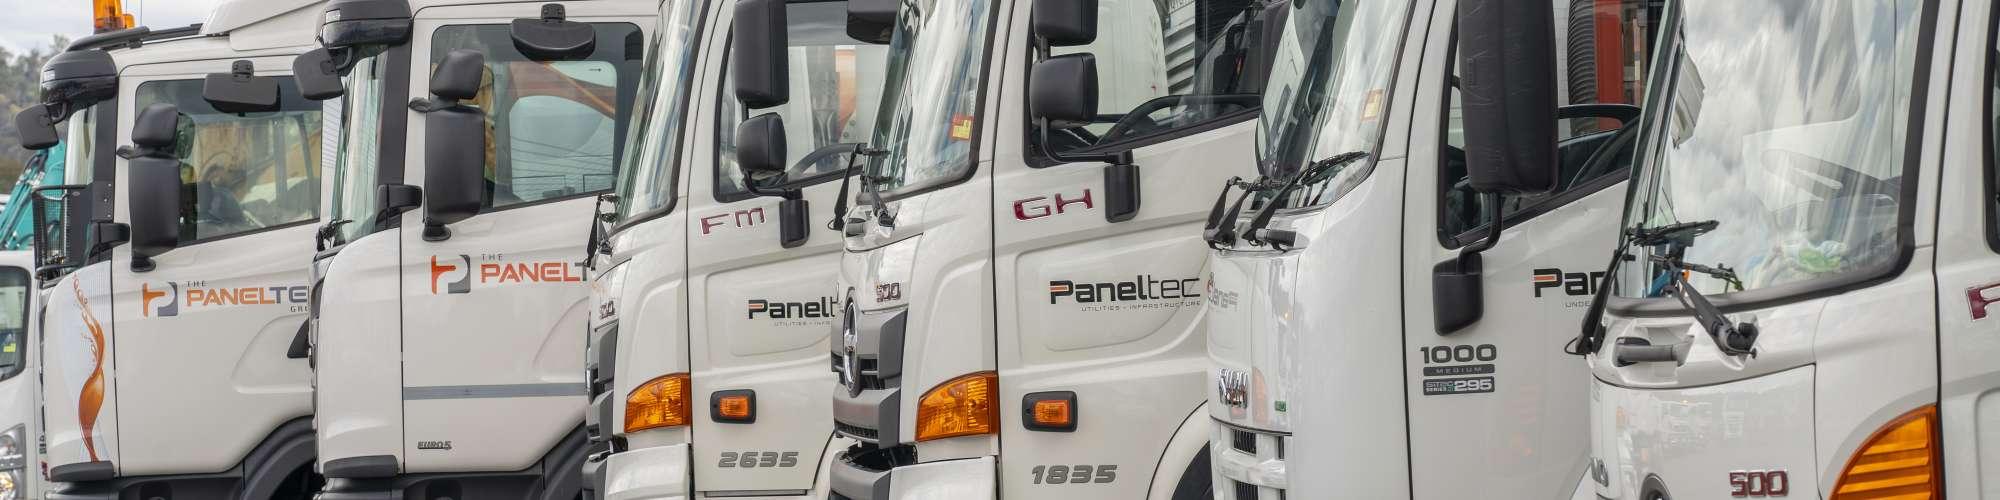 Paneltec1218 545